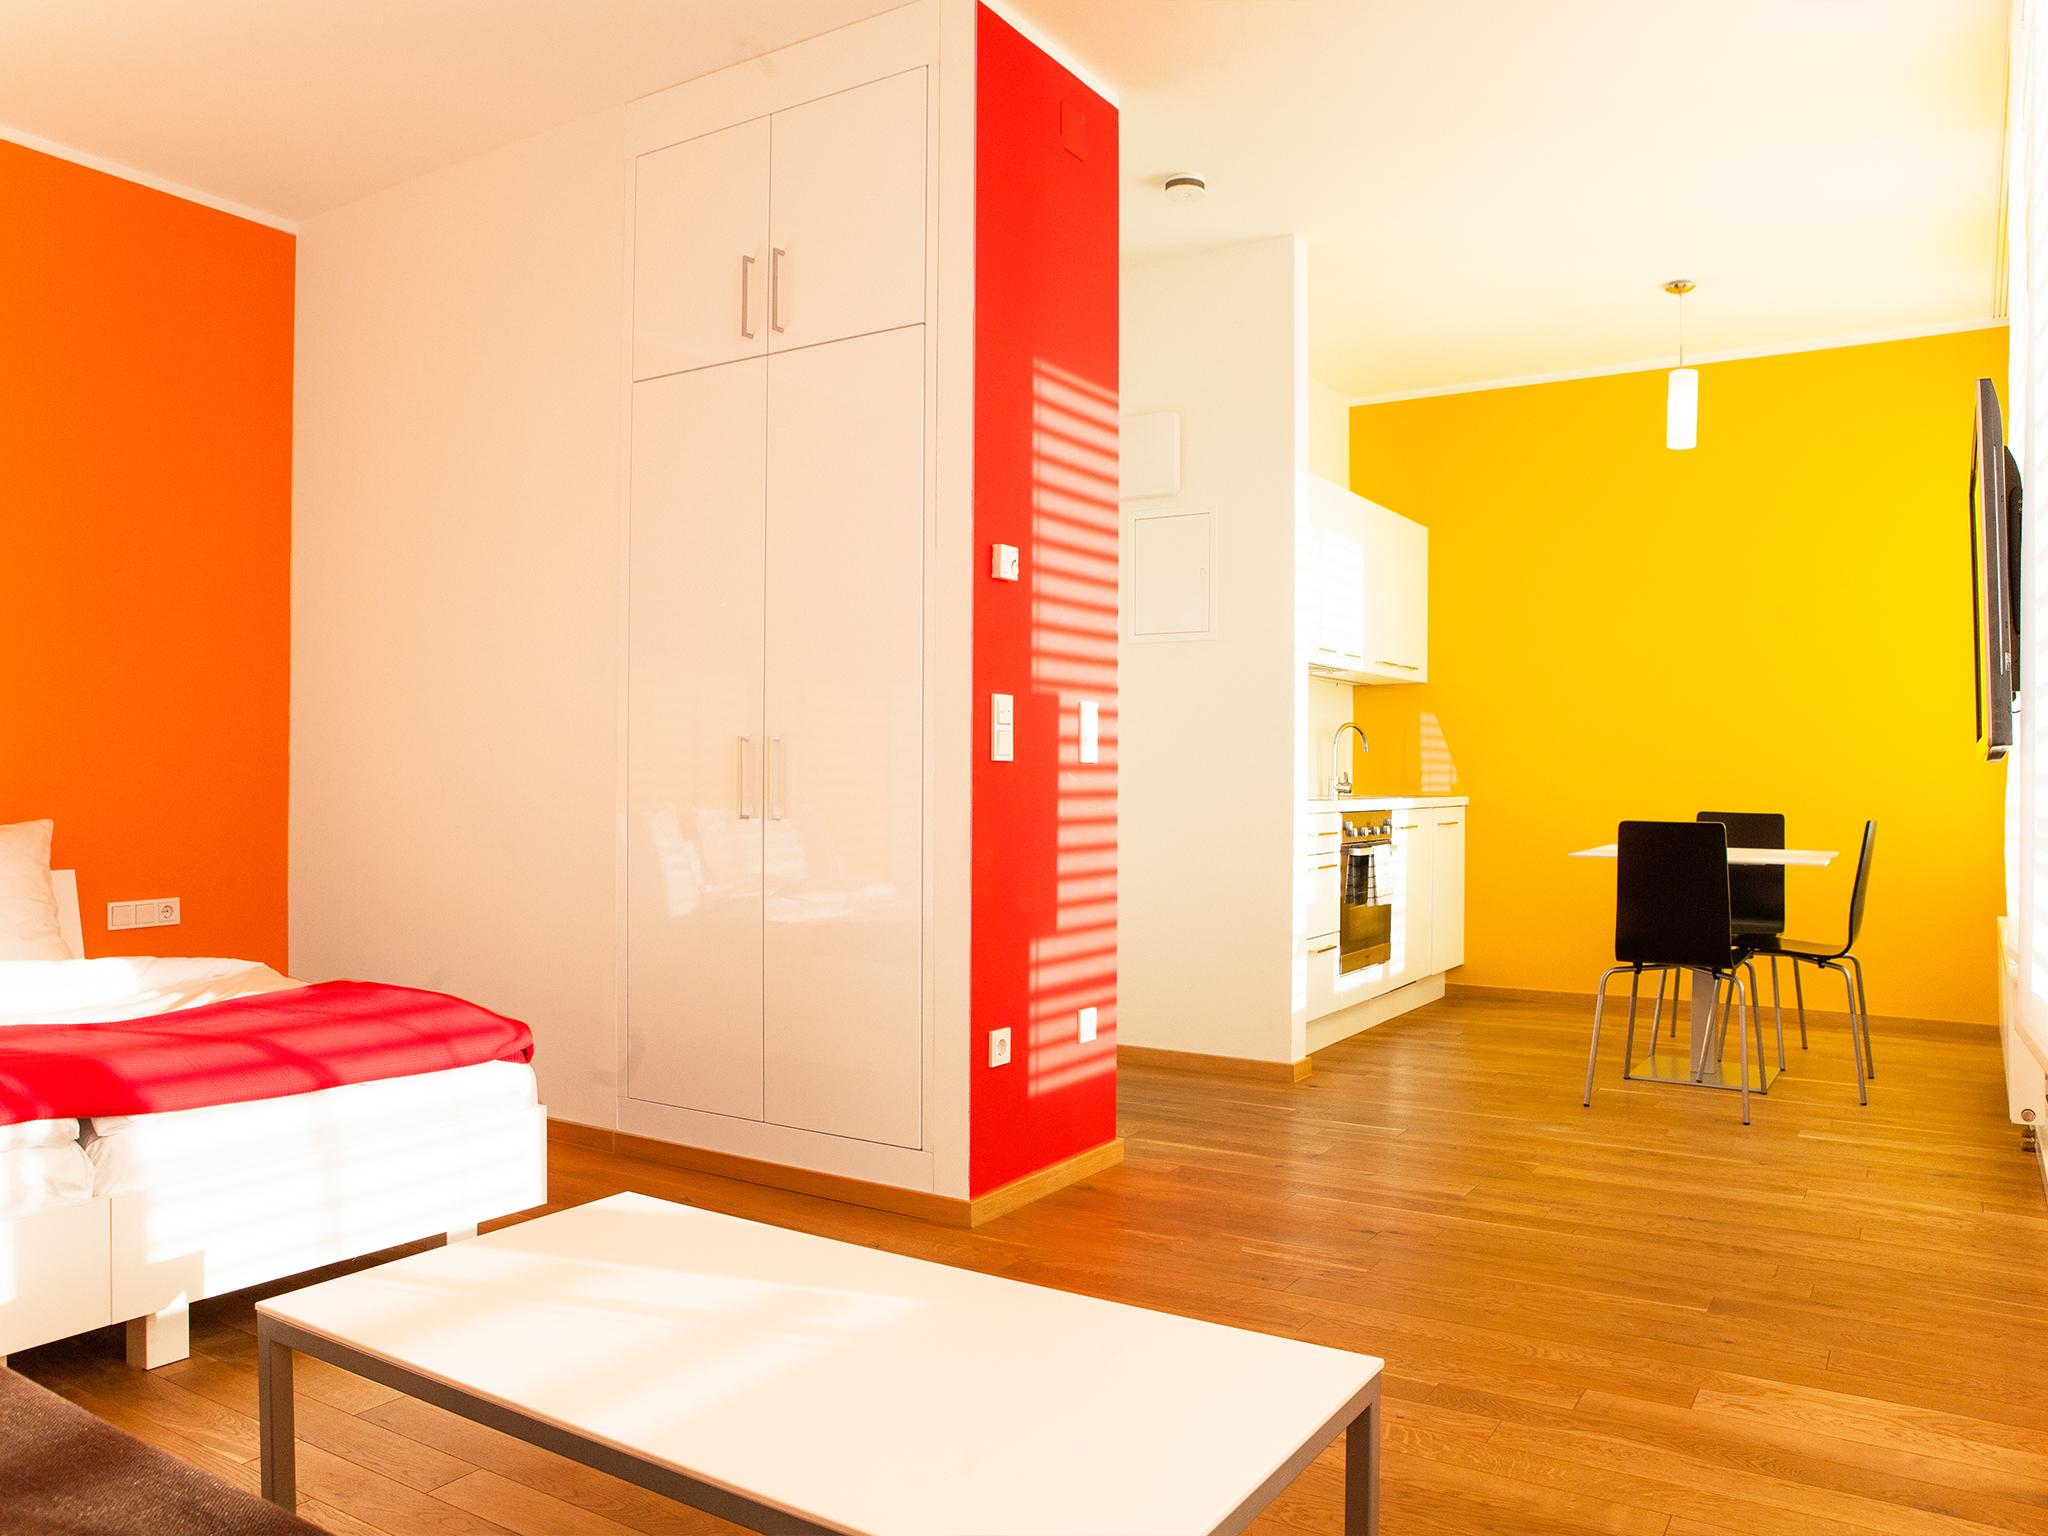 Apartment Feuer Wohnraum